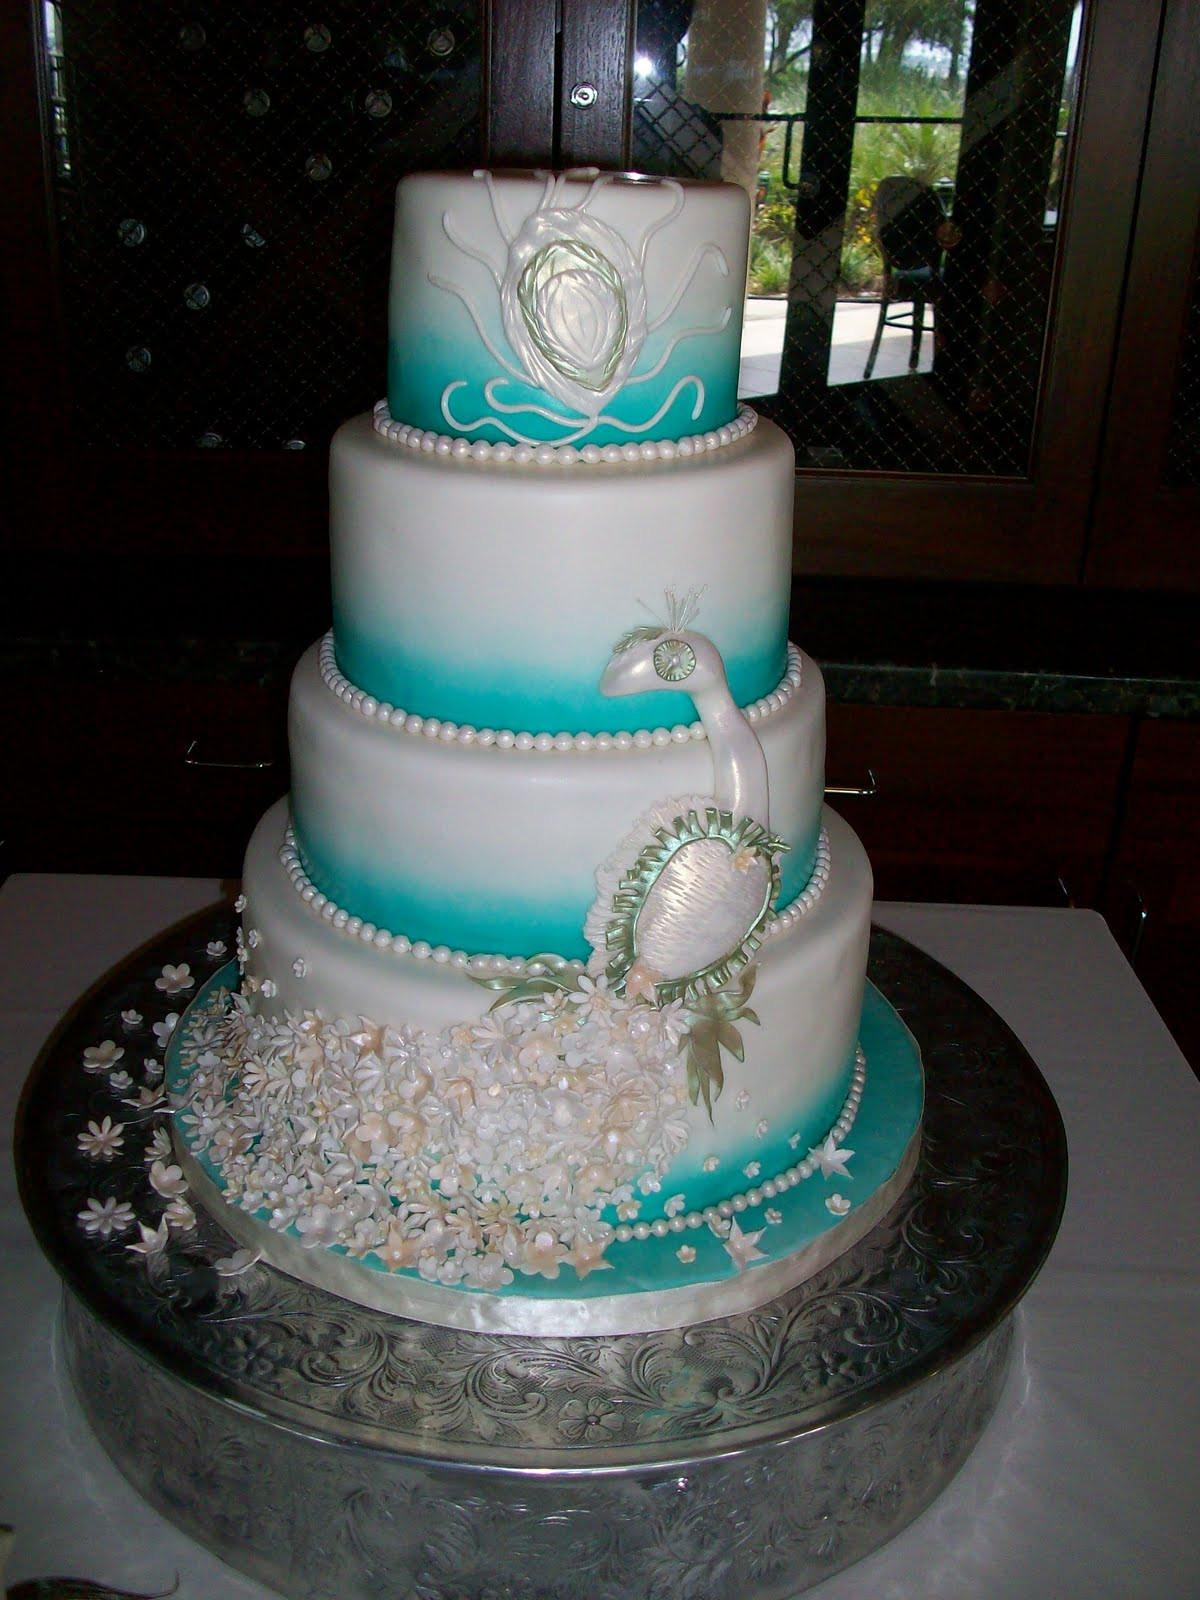 Wedding Cakes Theme  PEACOCK THEMED WEDDING CAKE